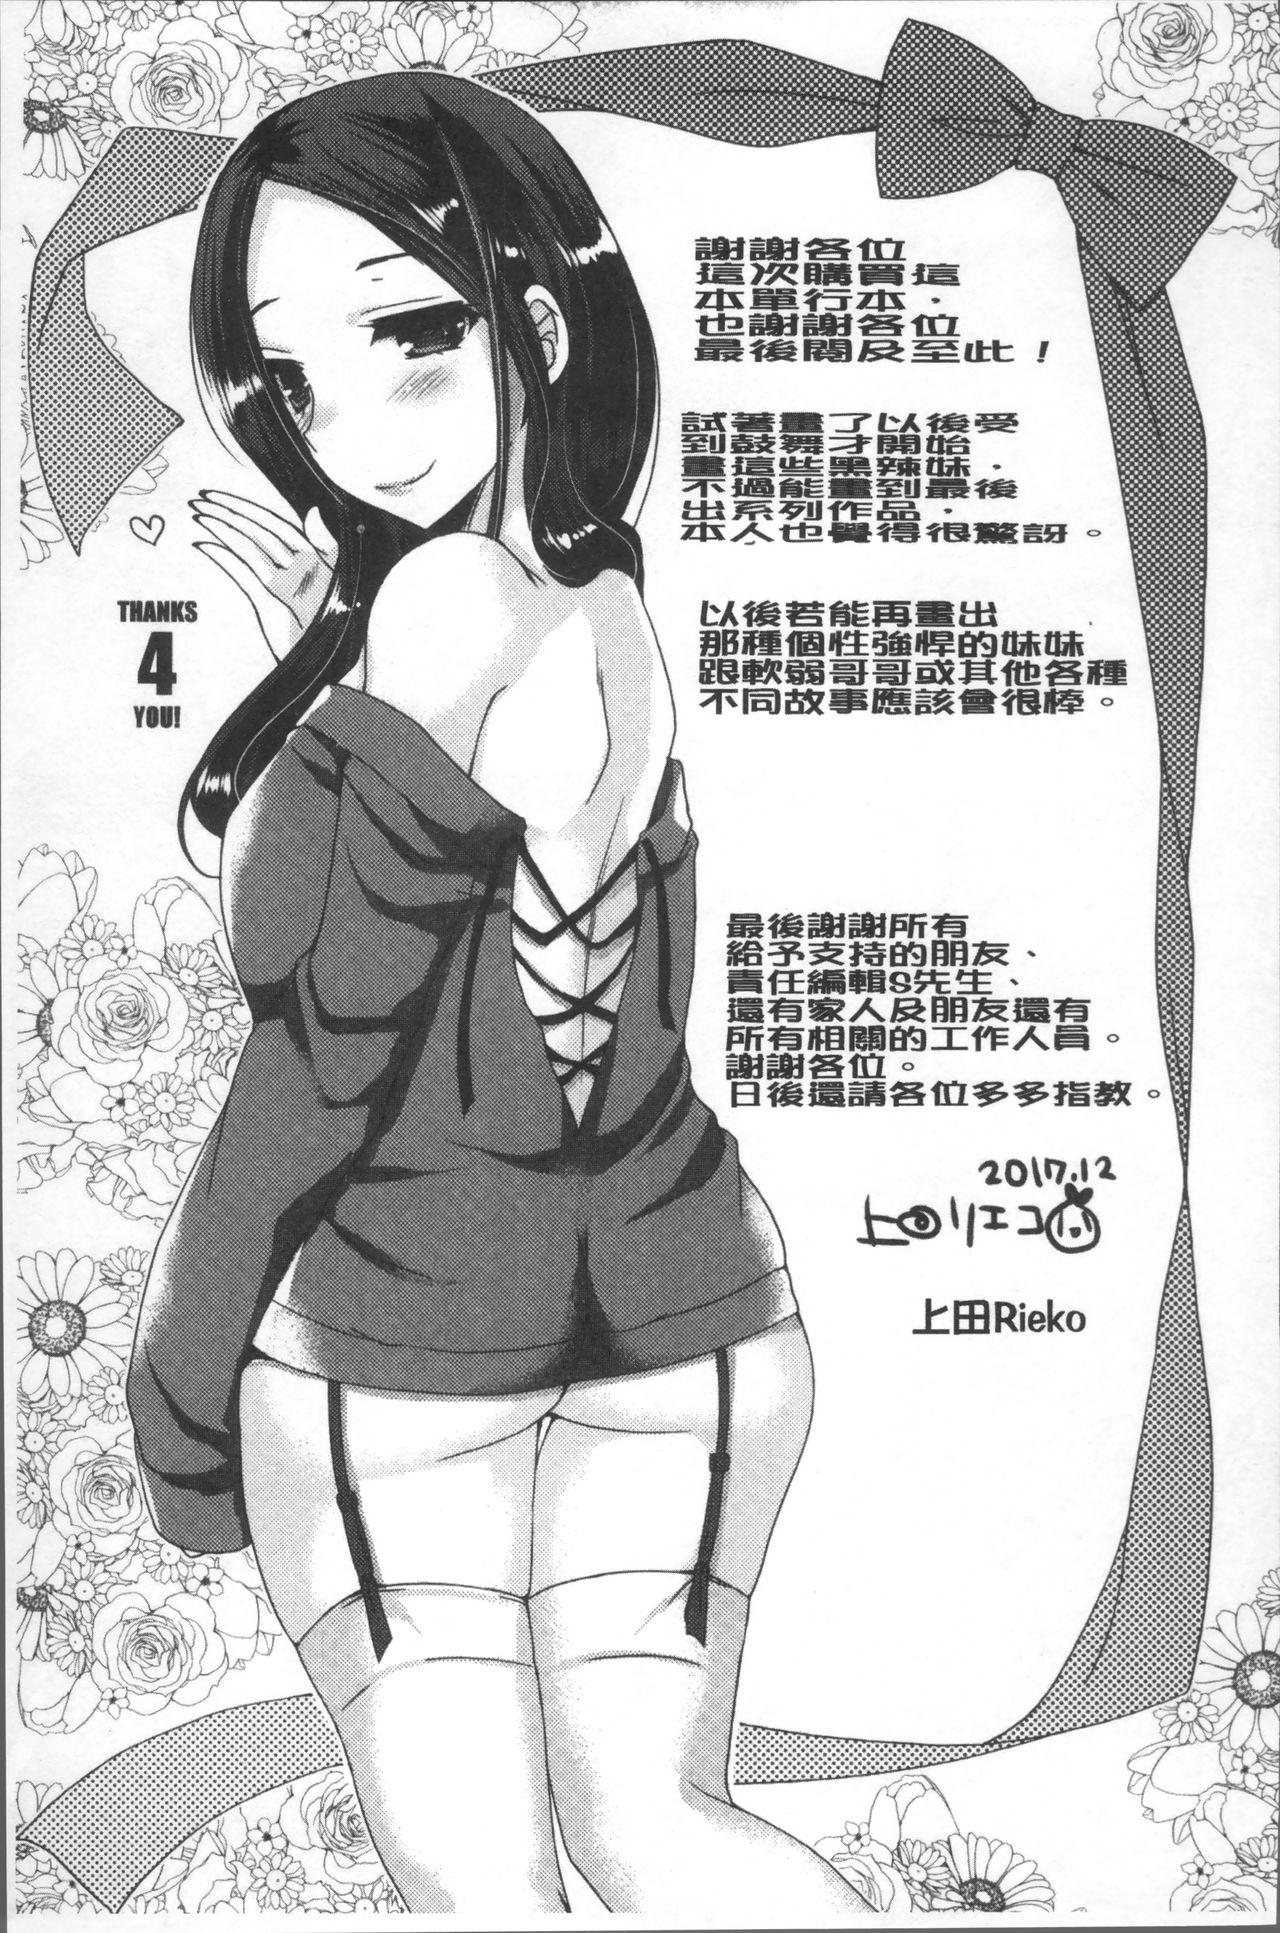 [Ueda Rieko] Doutei Killer na Imouto ~Bitch-kei Kyonyuu Gal ni Yarare Houdai~ | 童貞殺手的妹妹~被淫女系巨乳小辣妹給玩弄個過癮~ [Chinese] 198